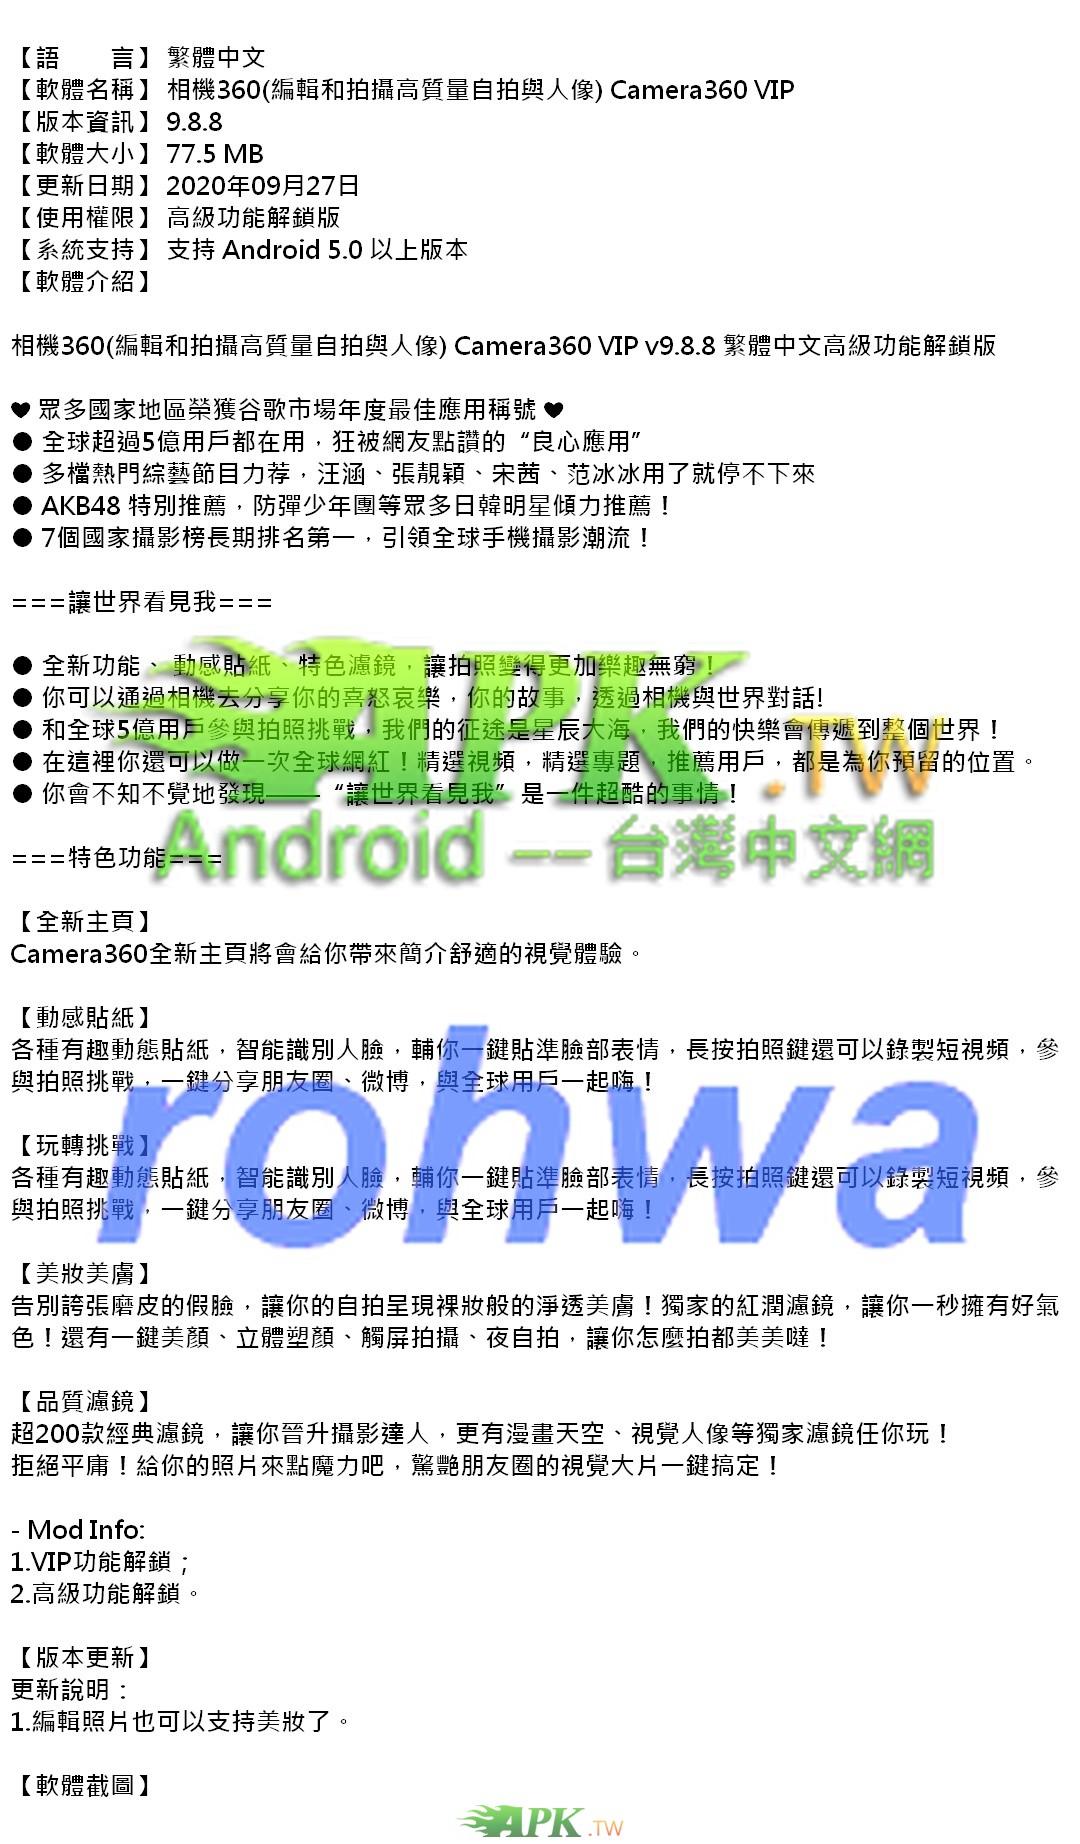 Camera360_VIP_Premium_9.8.8_.jpg